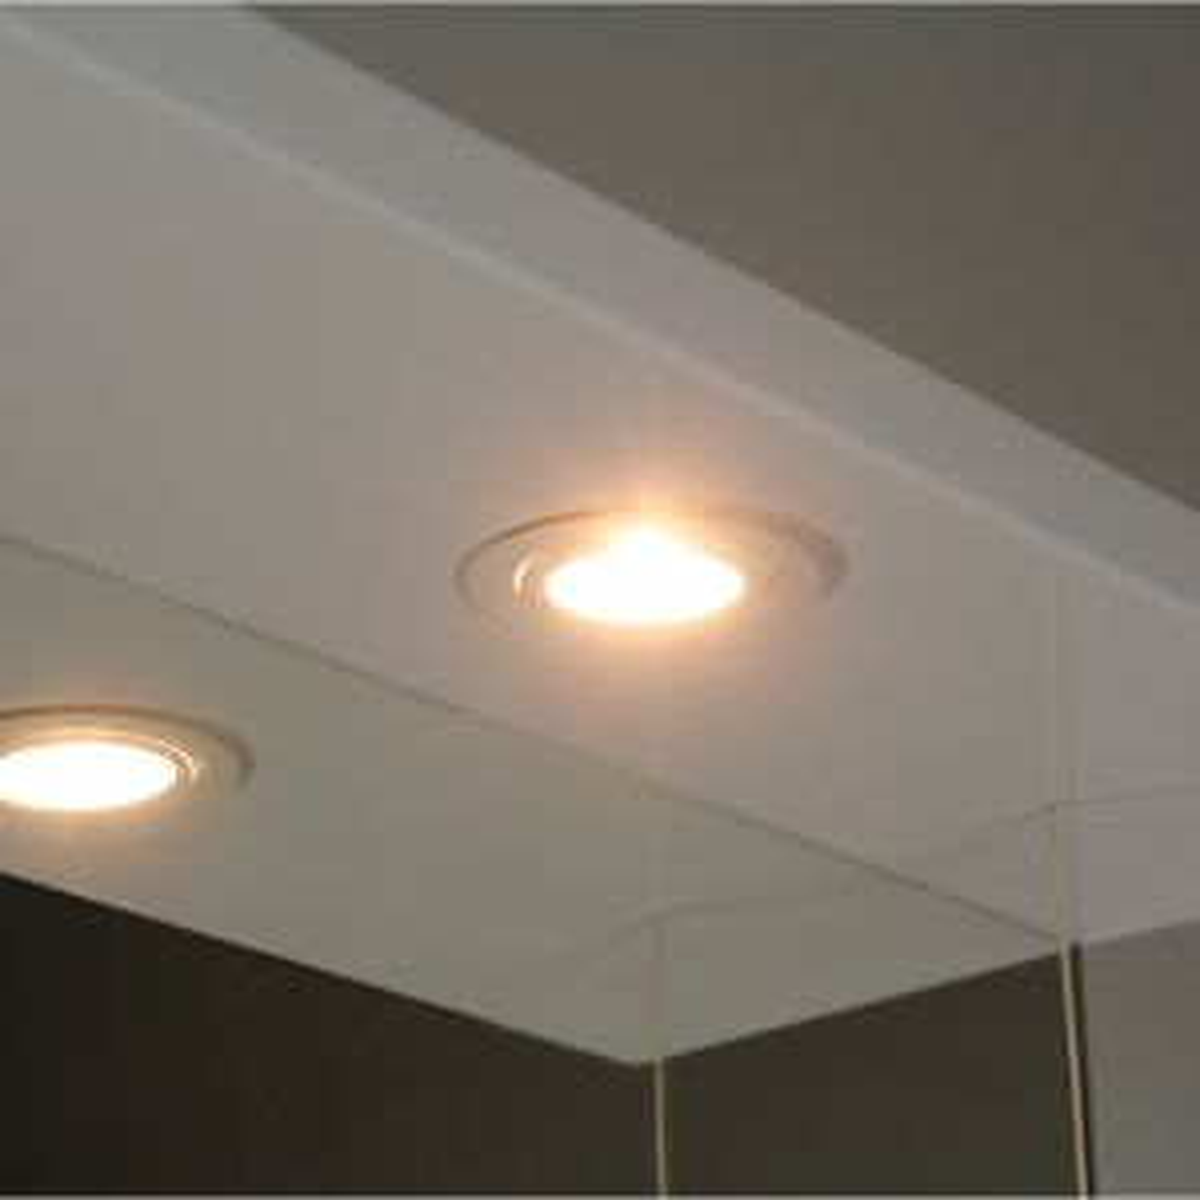 Premier High Gloss White Bathroom Mirror Light On